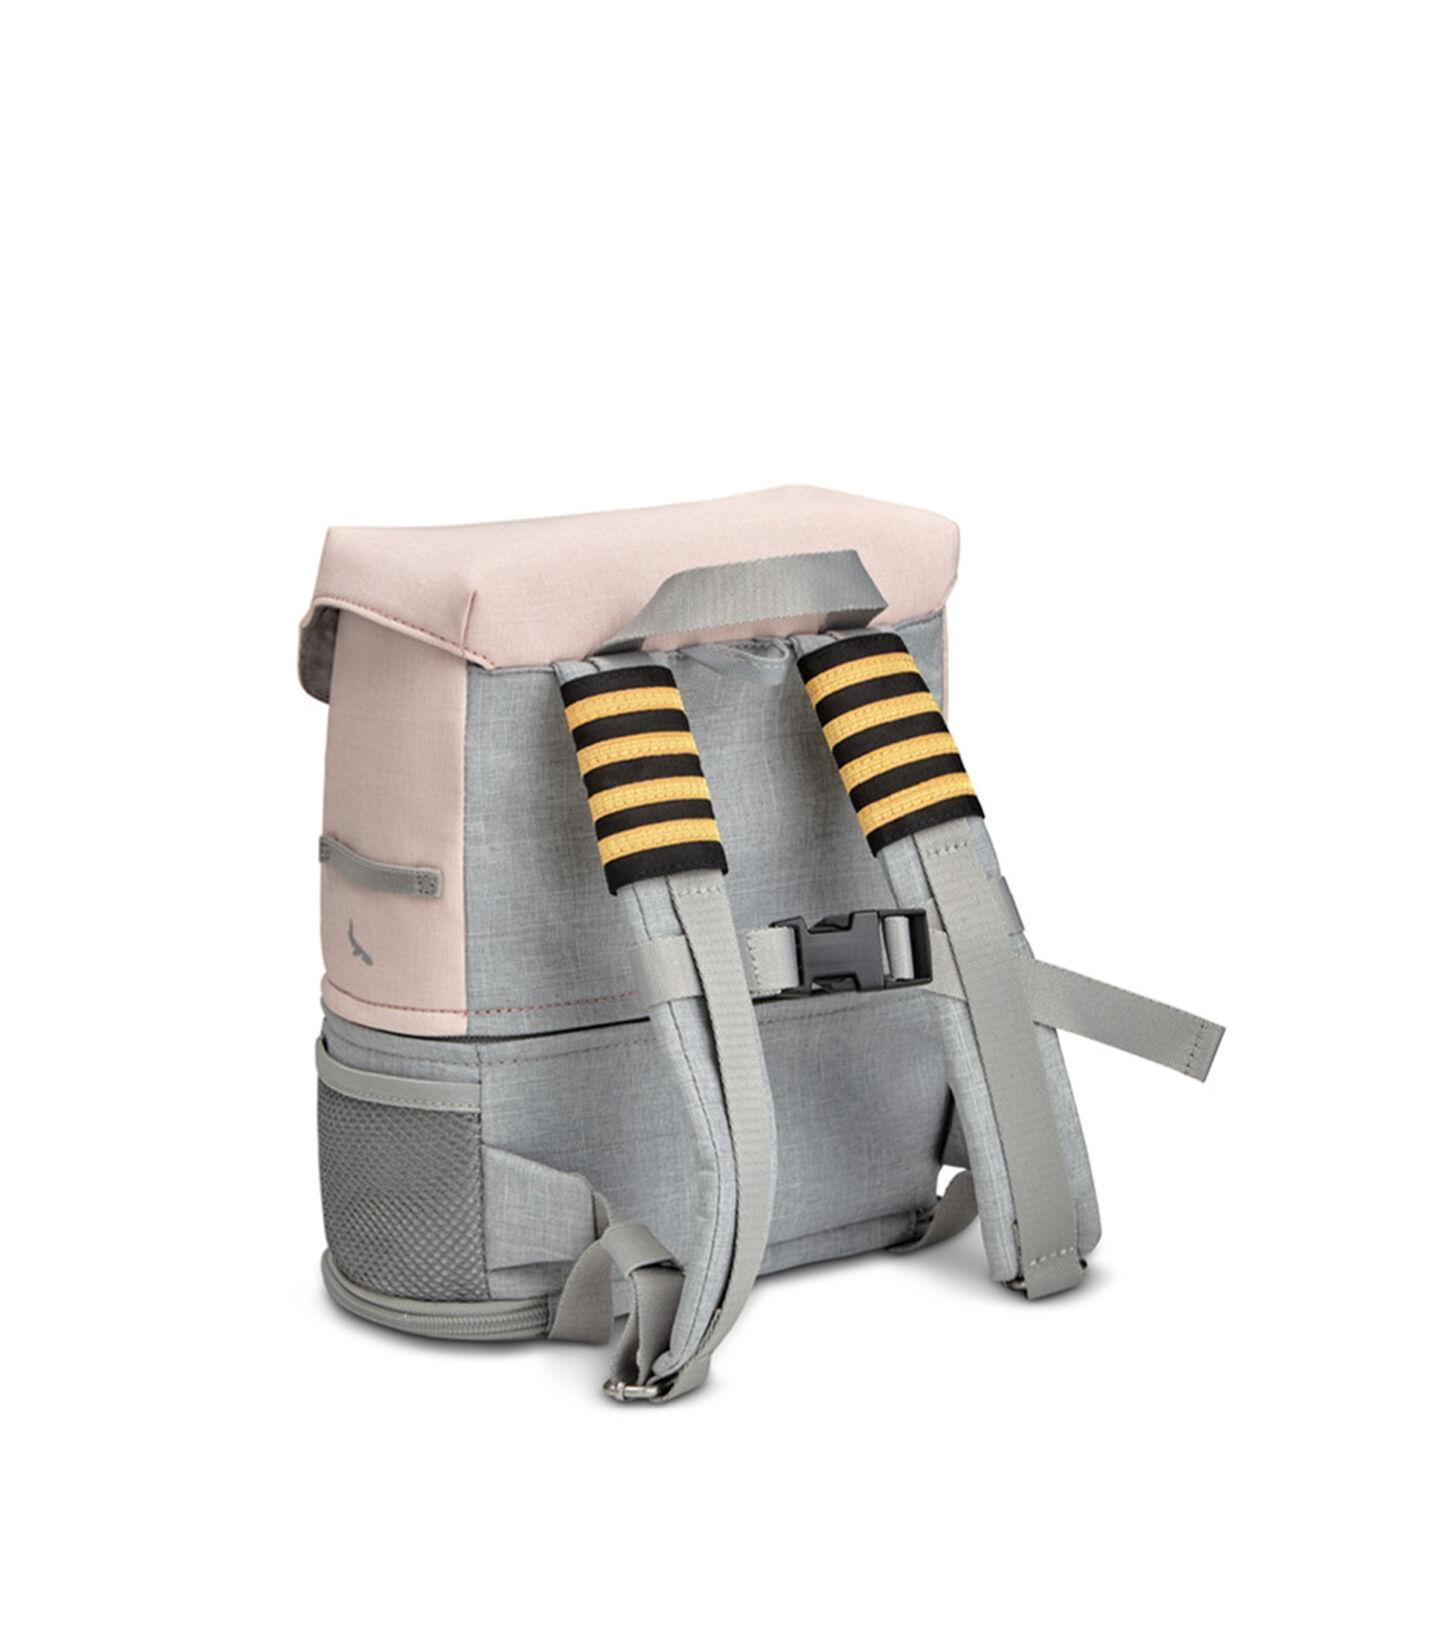 JETKIDS Crew Backpack Pink Lemonade, Pink Lemonade, mainview view 3